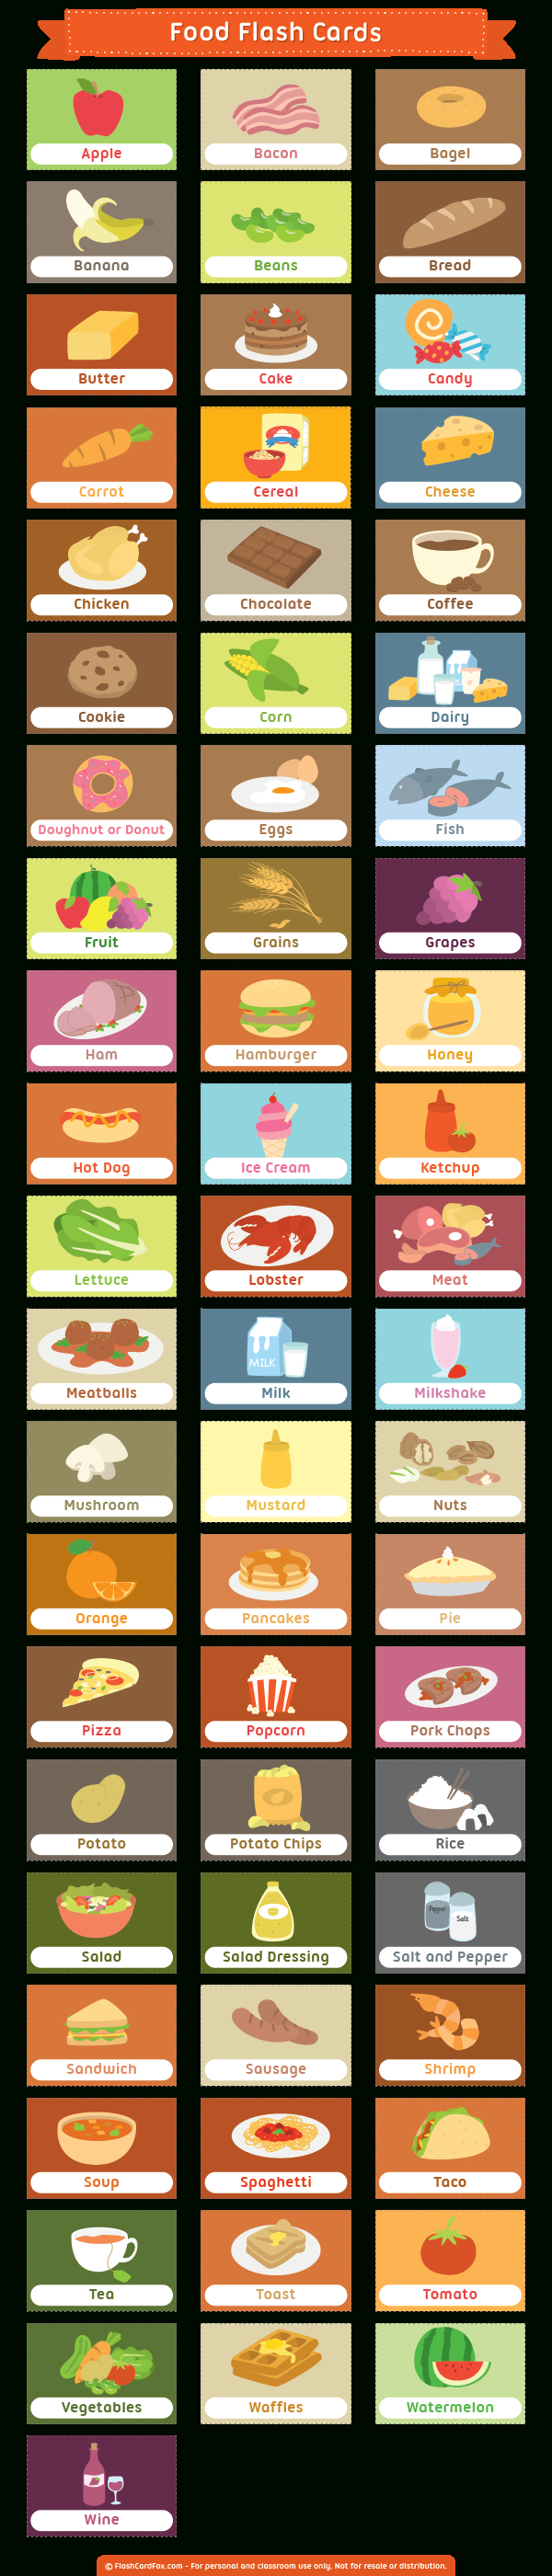 Printable Food Flash Cards - Free Printable Food Cards